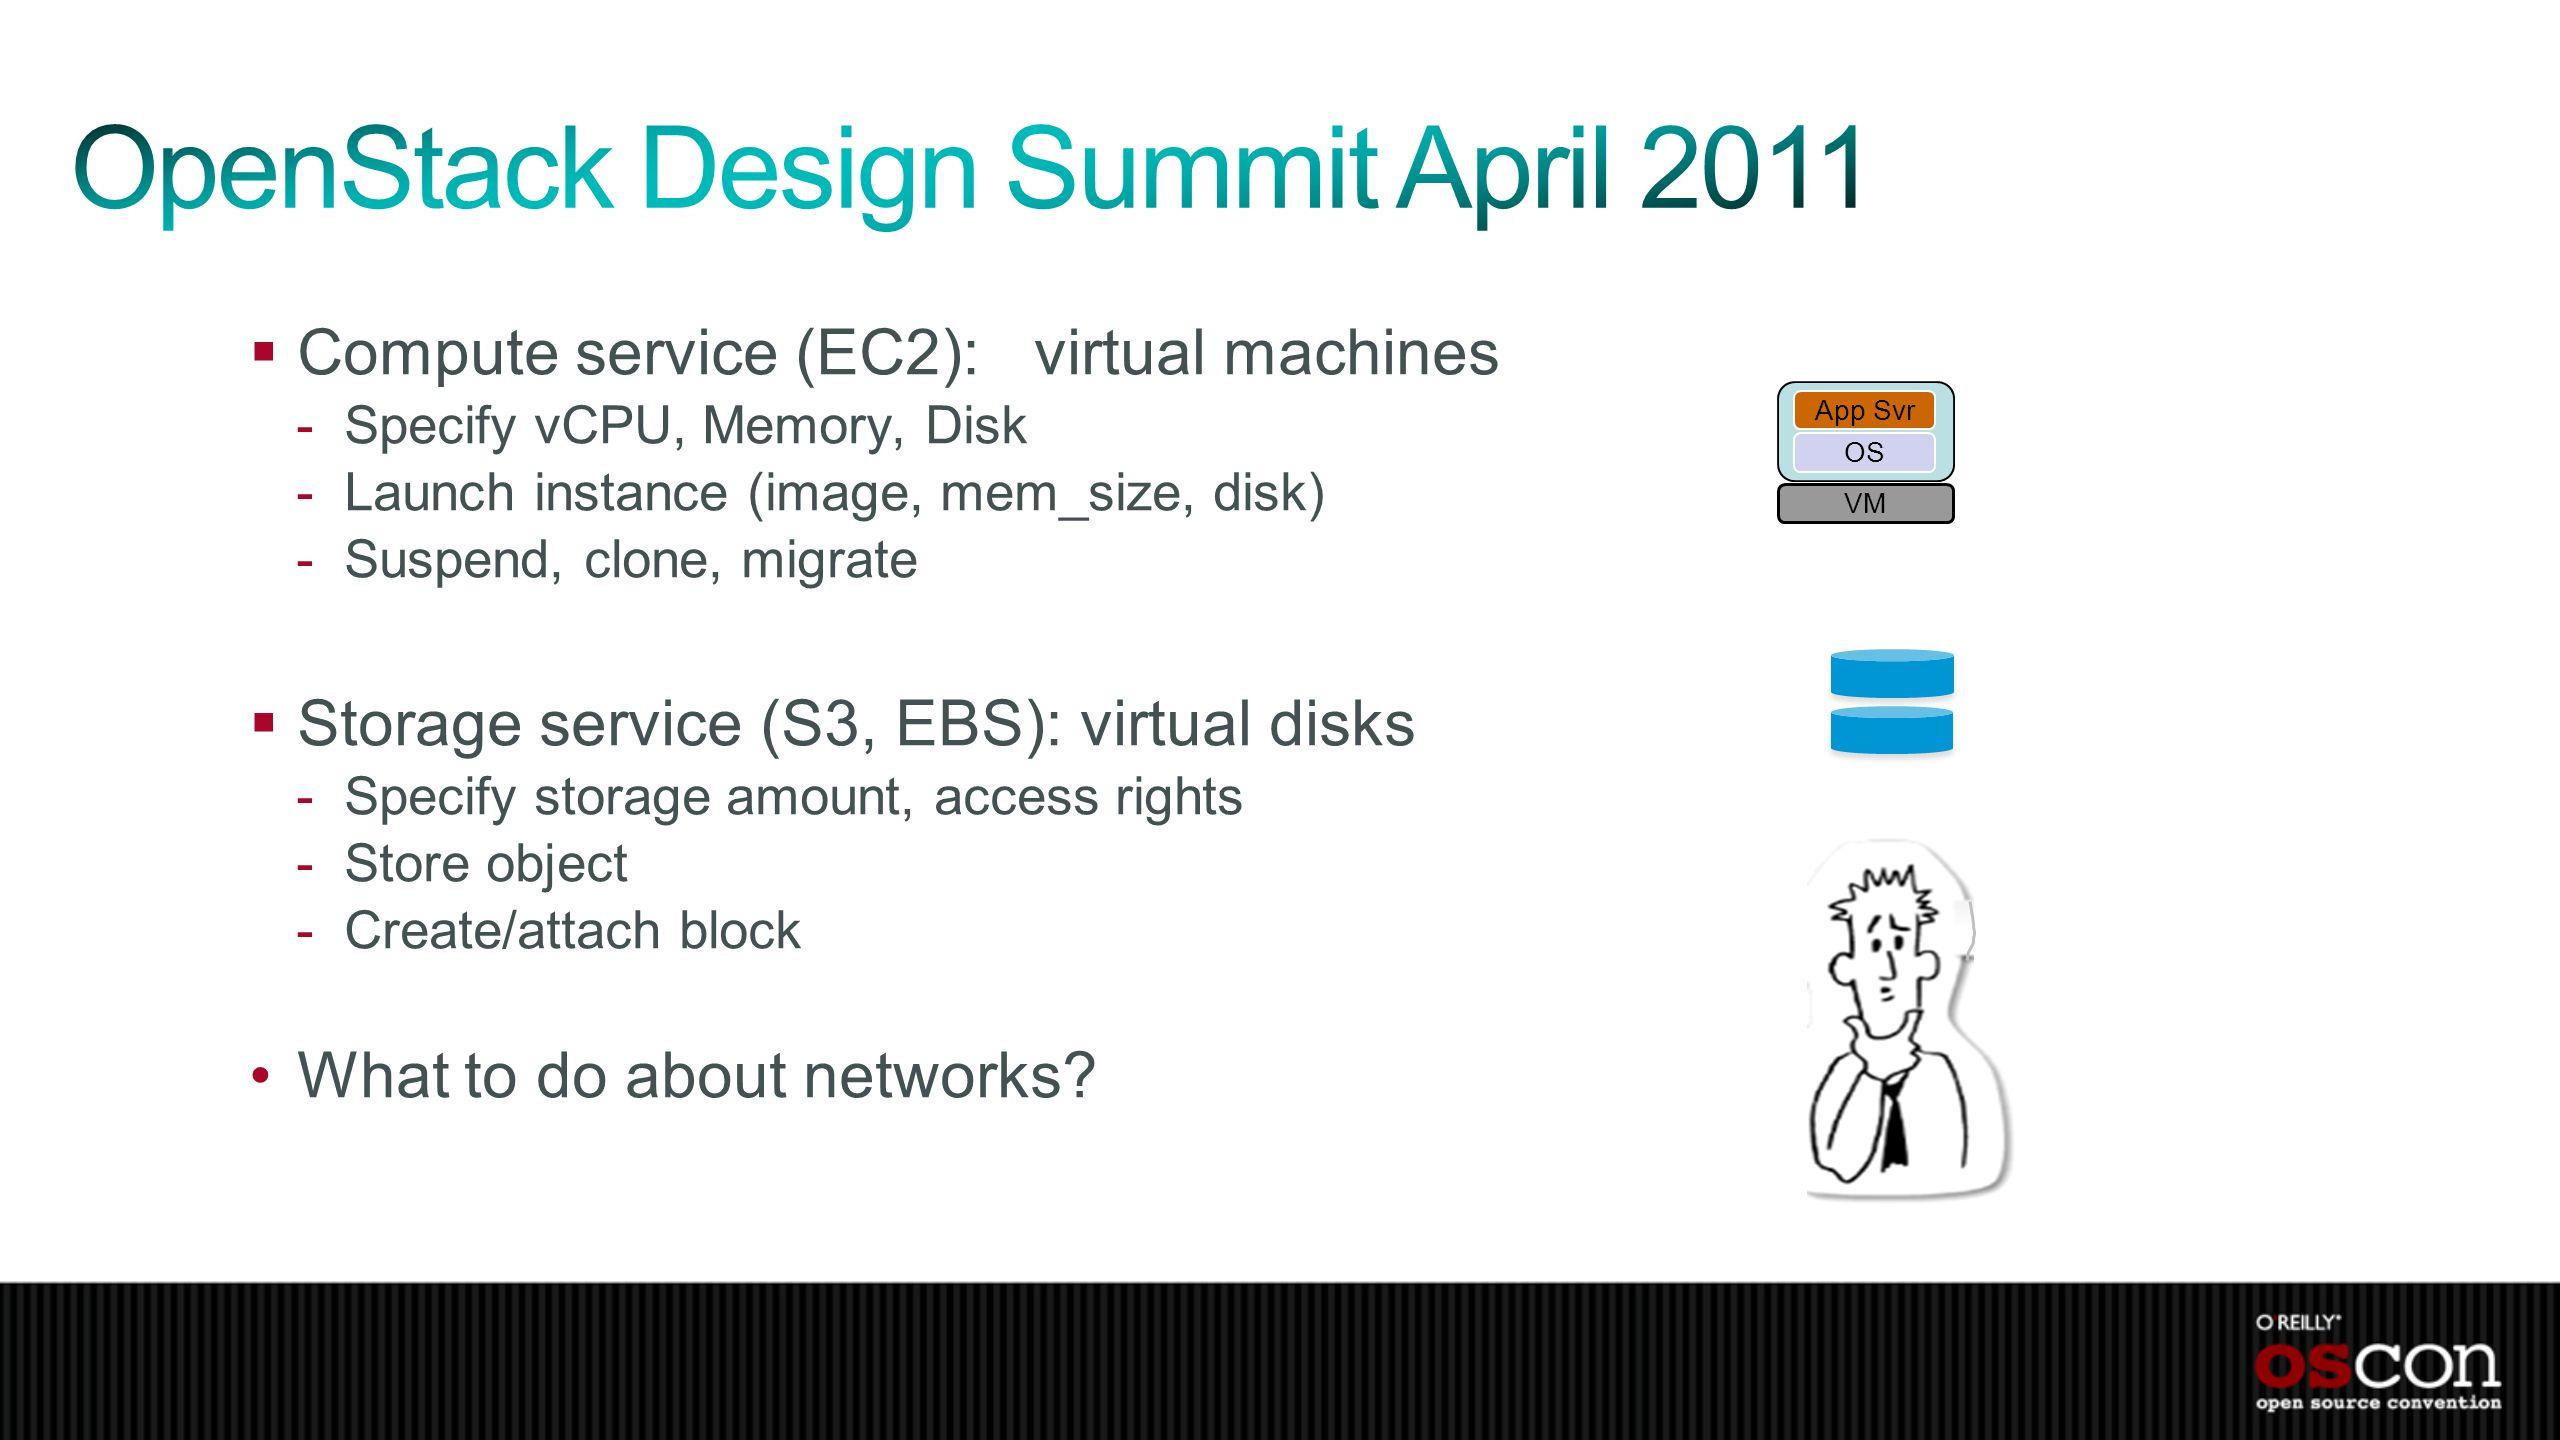 Compute service (EC2): virtual machines -Specify vCPU, Memory, Disk -Launch instance (image, mem_size, disk) -Suspend, clone, migrate Storage service